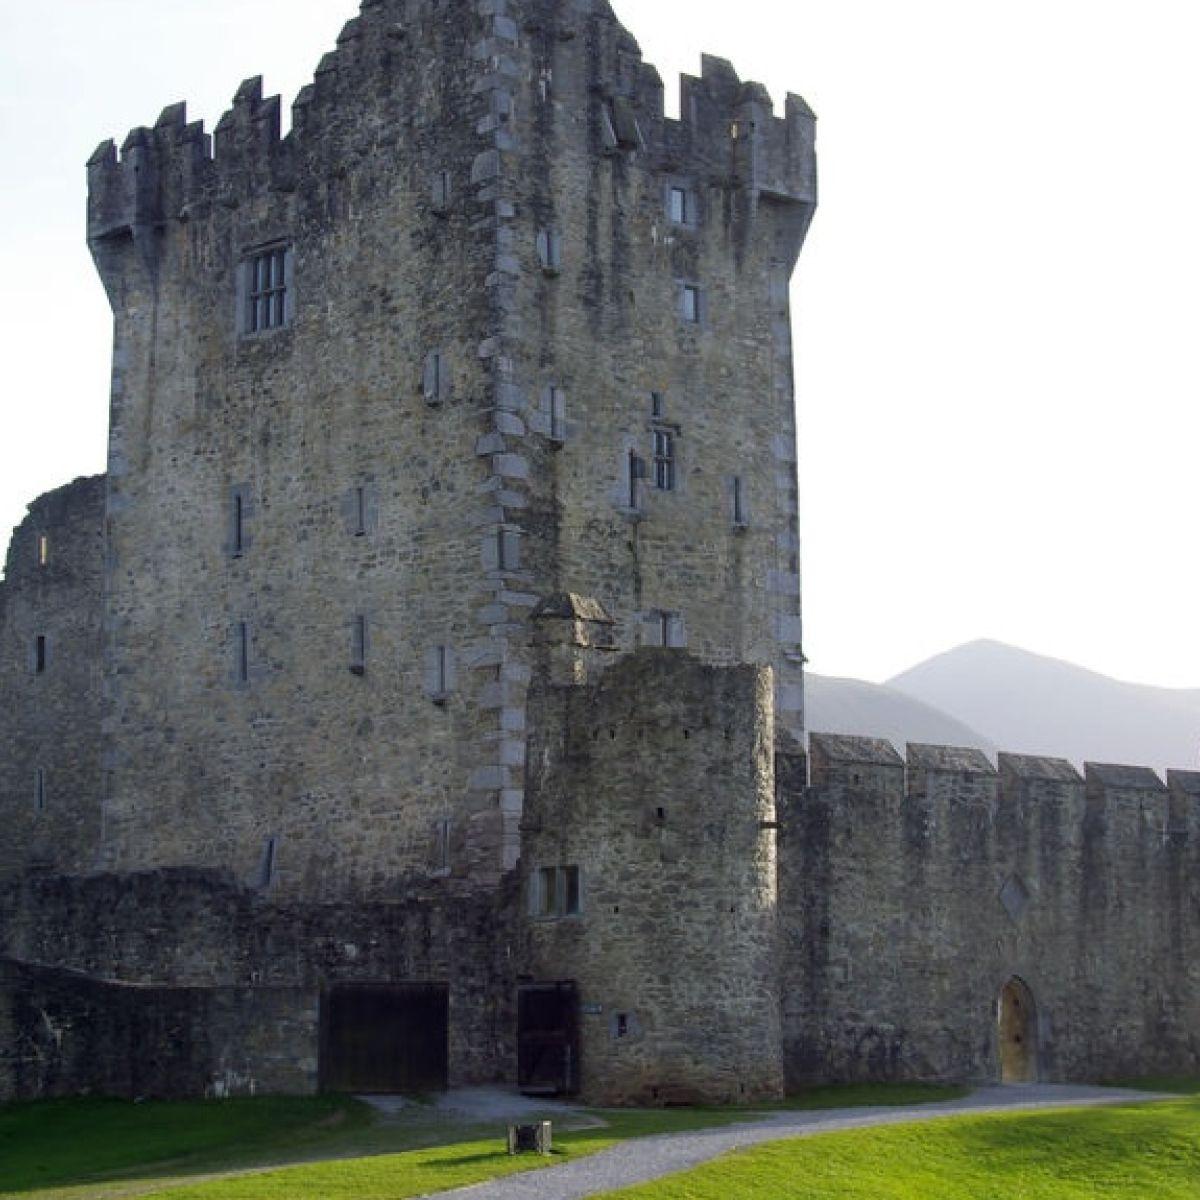 Killarney Dating Site, 100% Free Online Dating in Killarney,